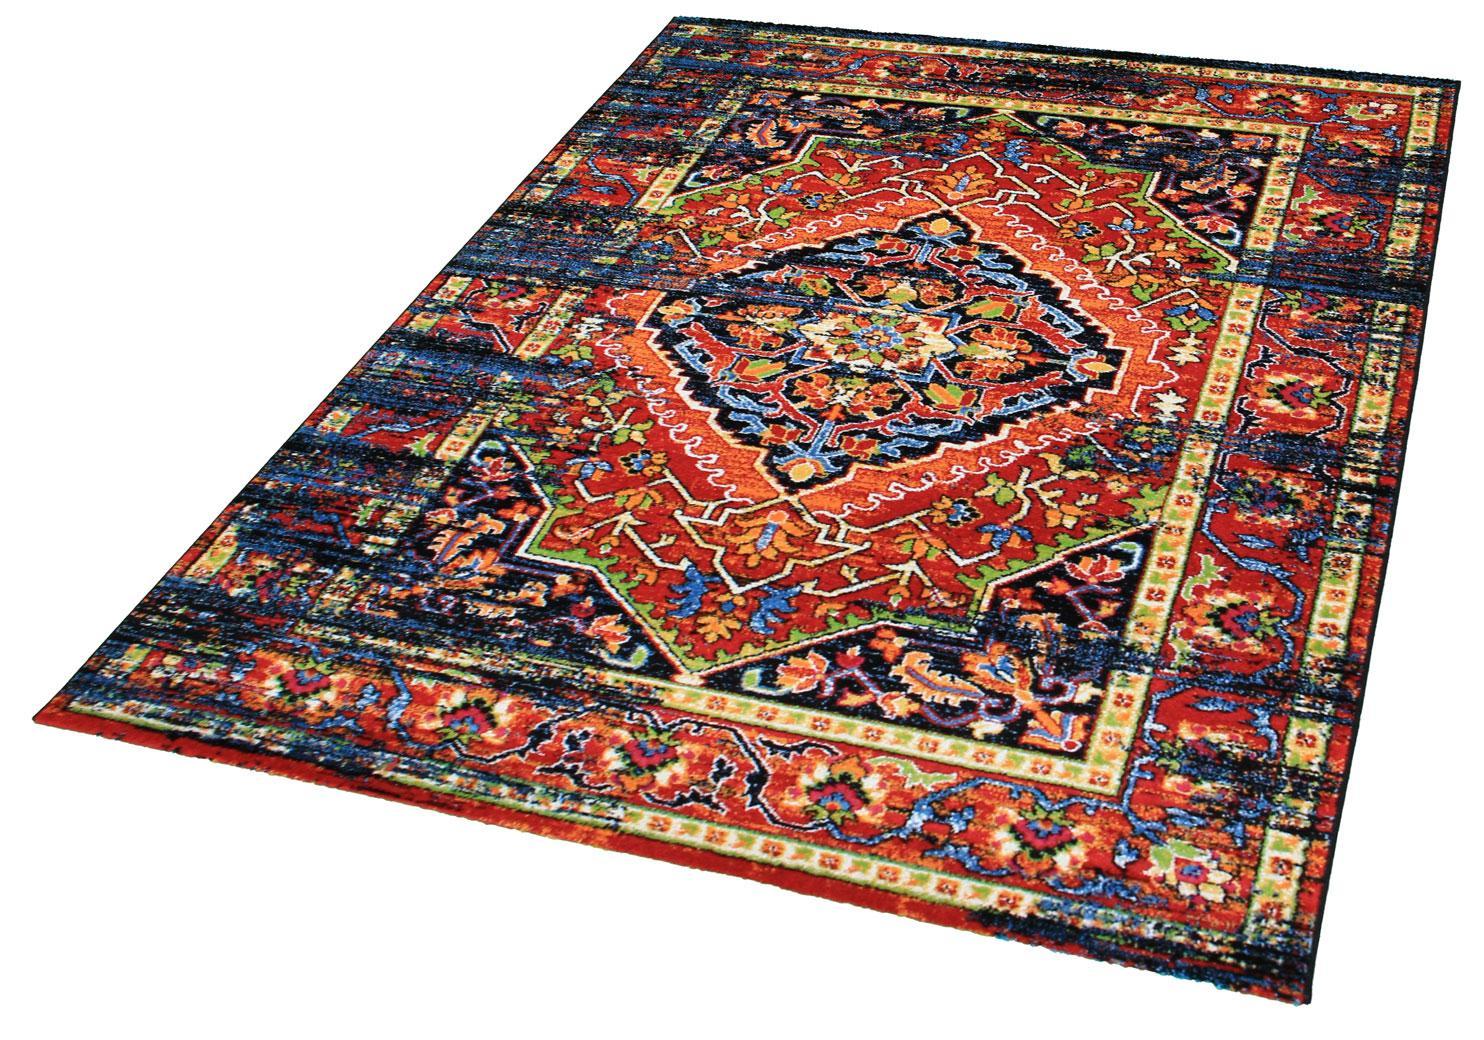 Teppich Vintage 1614 Impression rechteckig Höhe 13 mm